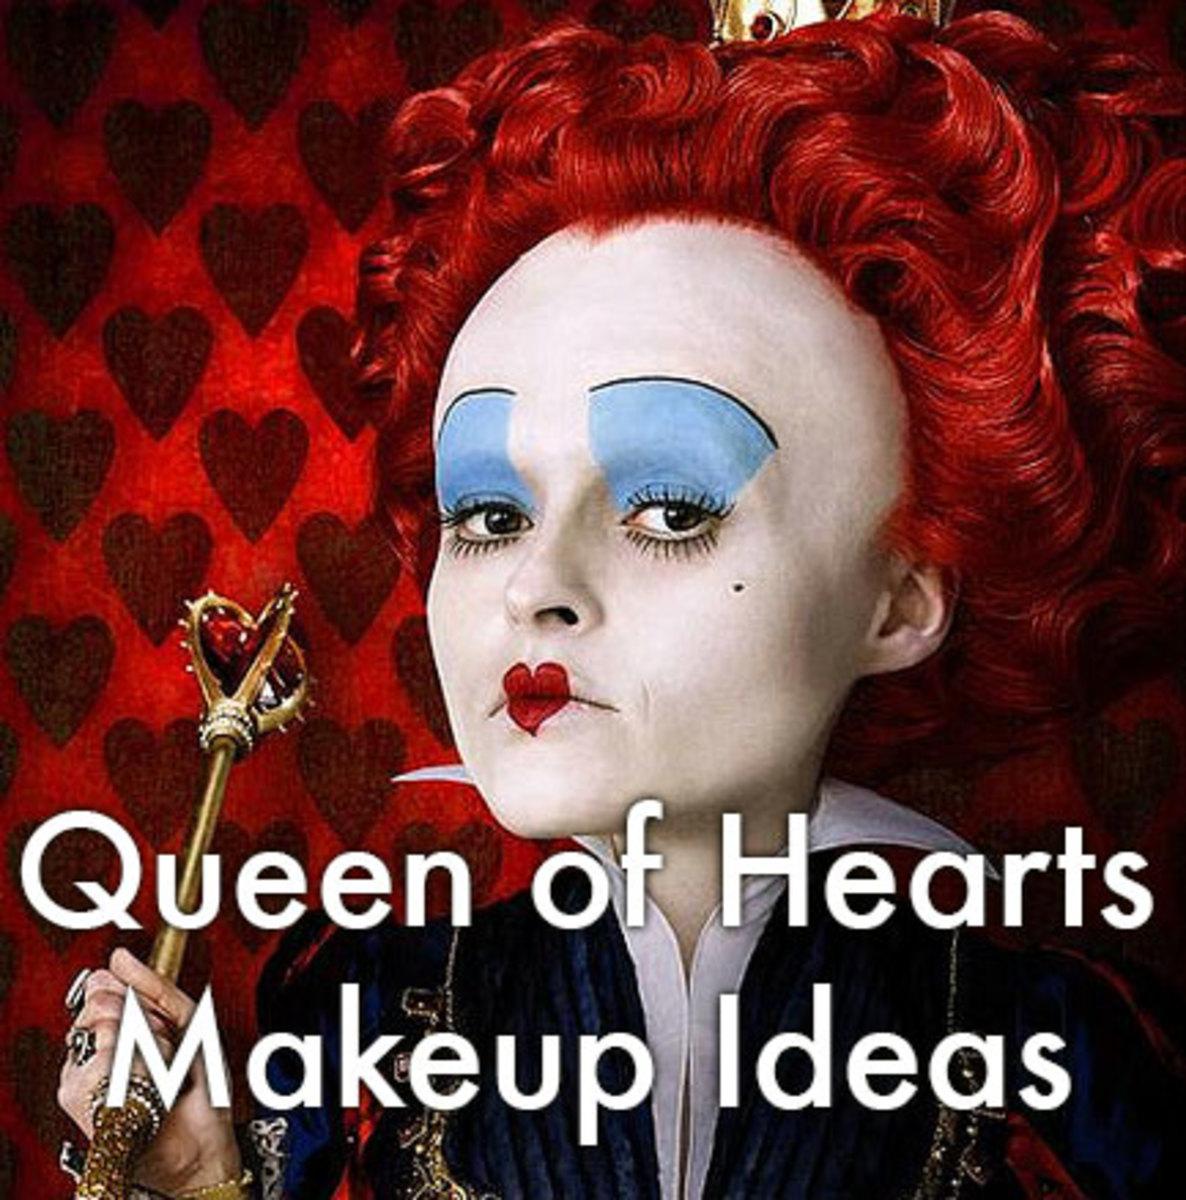 Makeup ideas and tutorials for Tim Burton's Queen of Hearts